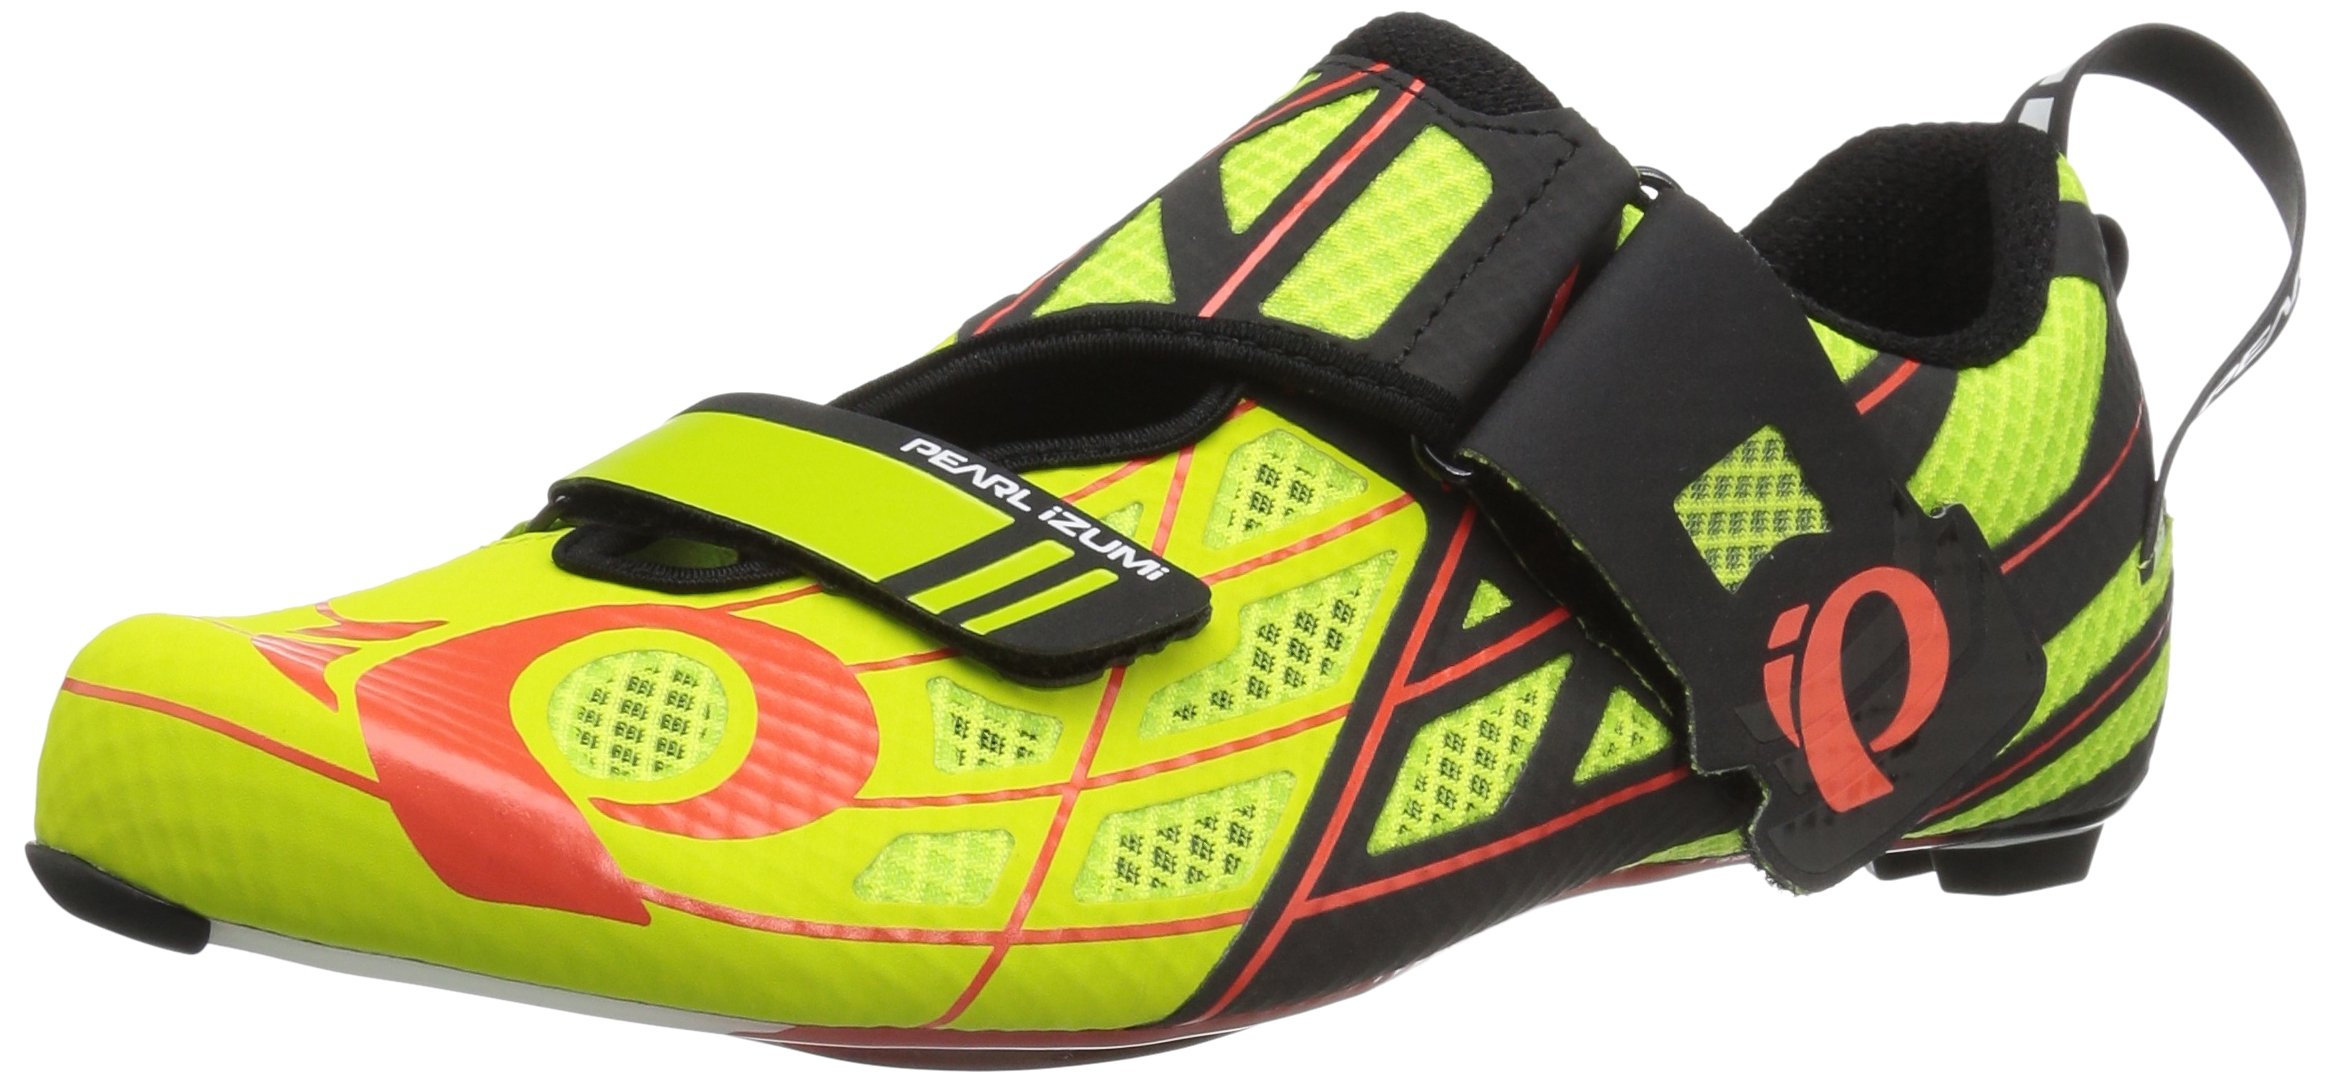 Pearl Izumi Tri Fly Pro v3 Cycling Shoe, Lime Punch/Black, 41 EU/7.7 D US